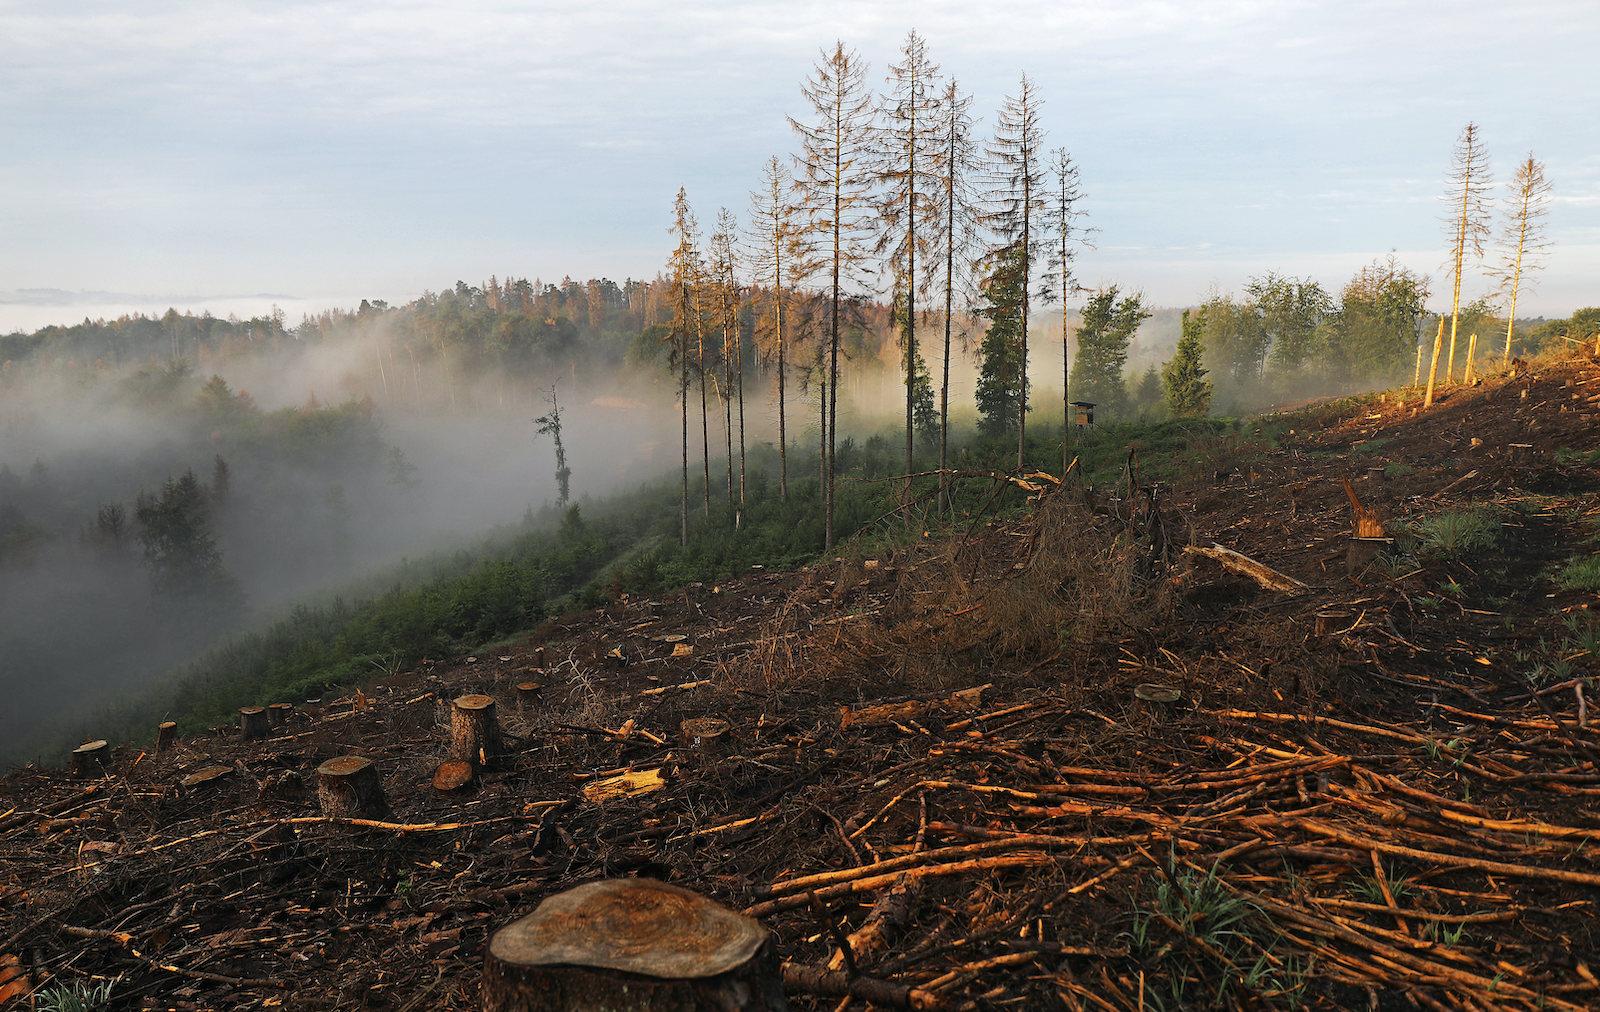 Rewild to mitigate the climate crisis, urge leading scientists